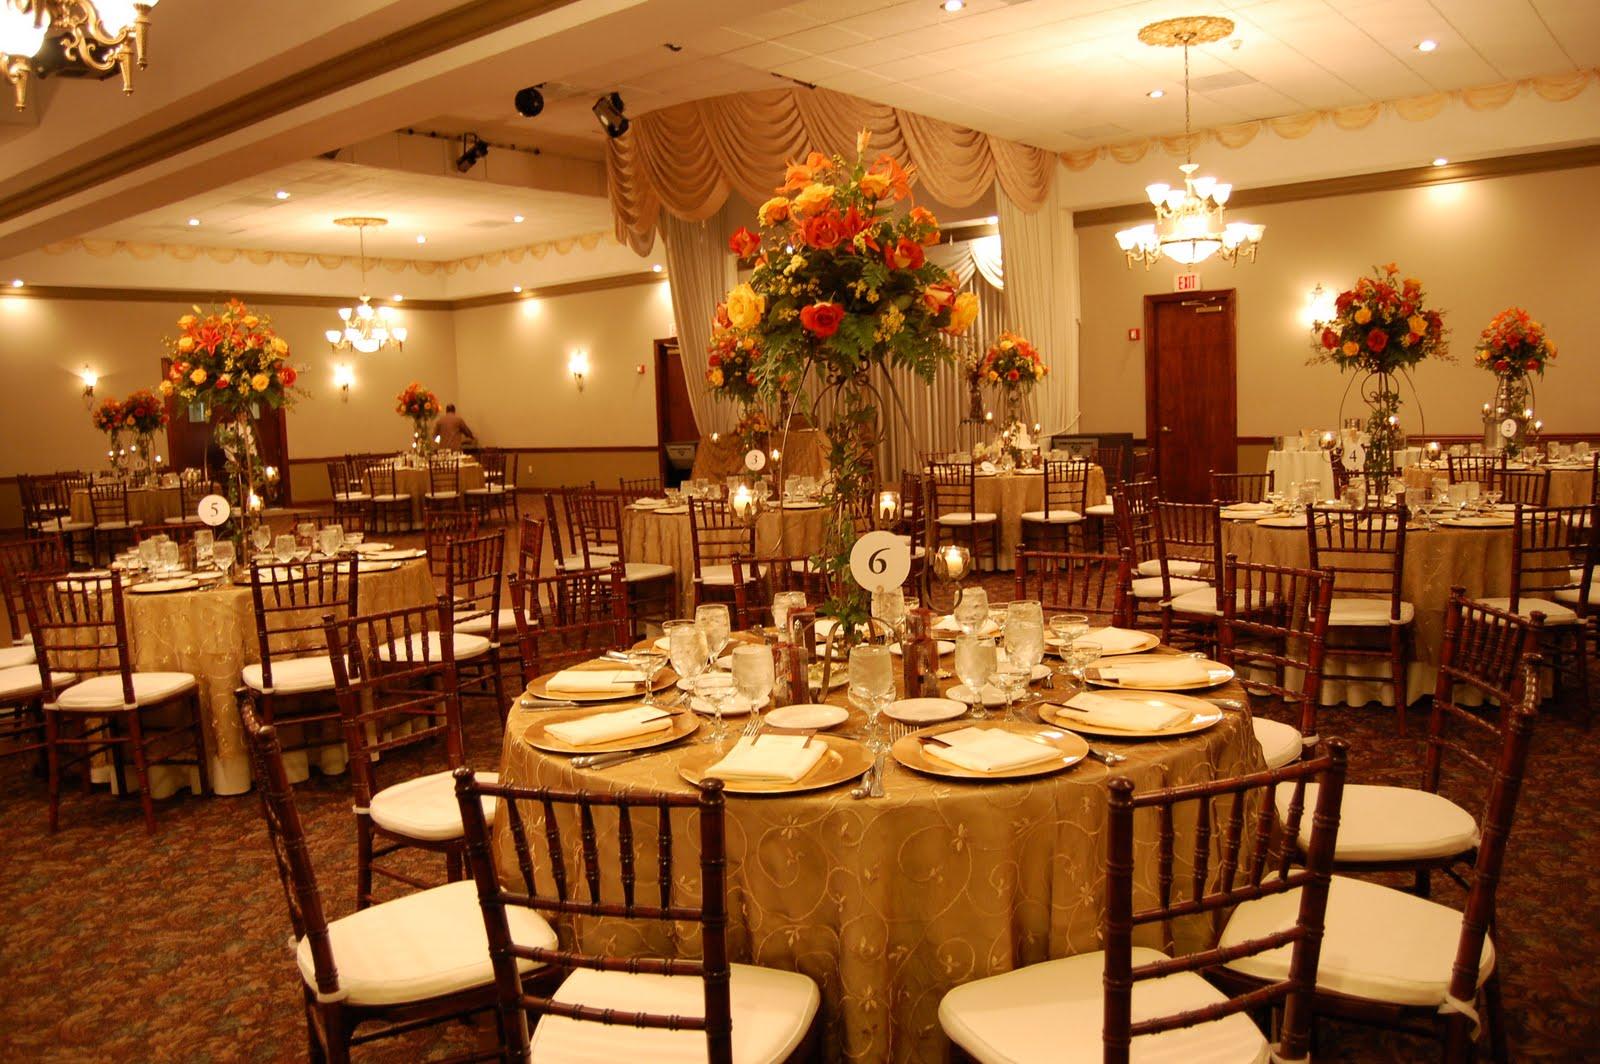 Plum Colored Wedding Decorations Living Room Interior Designs